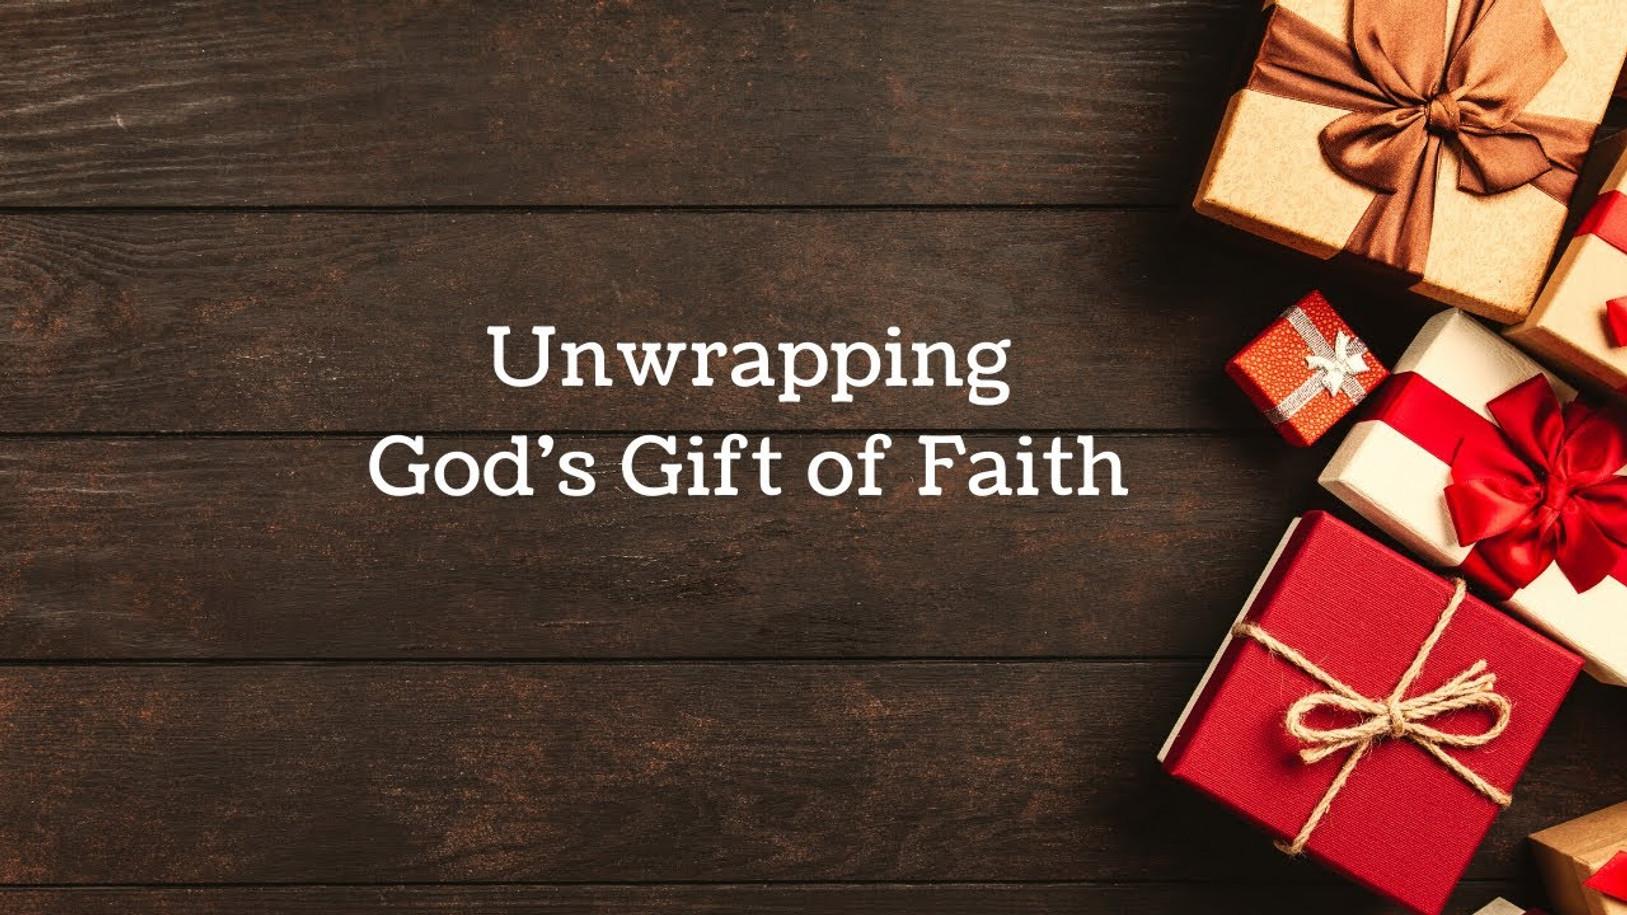 Uwrapping God's Gift of Faith